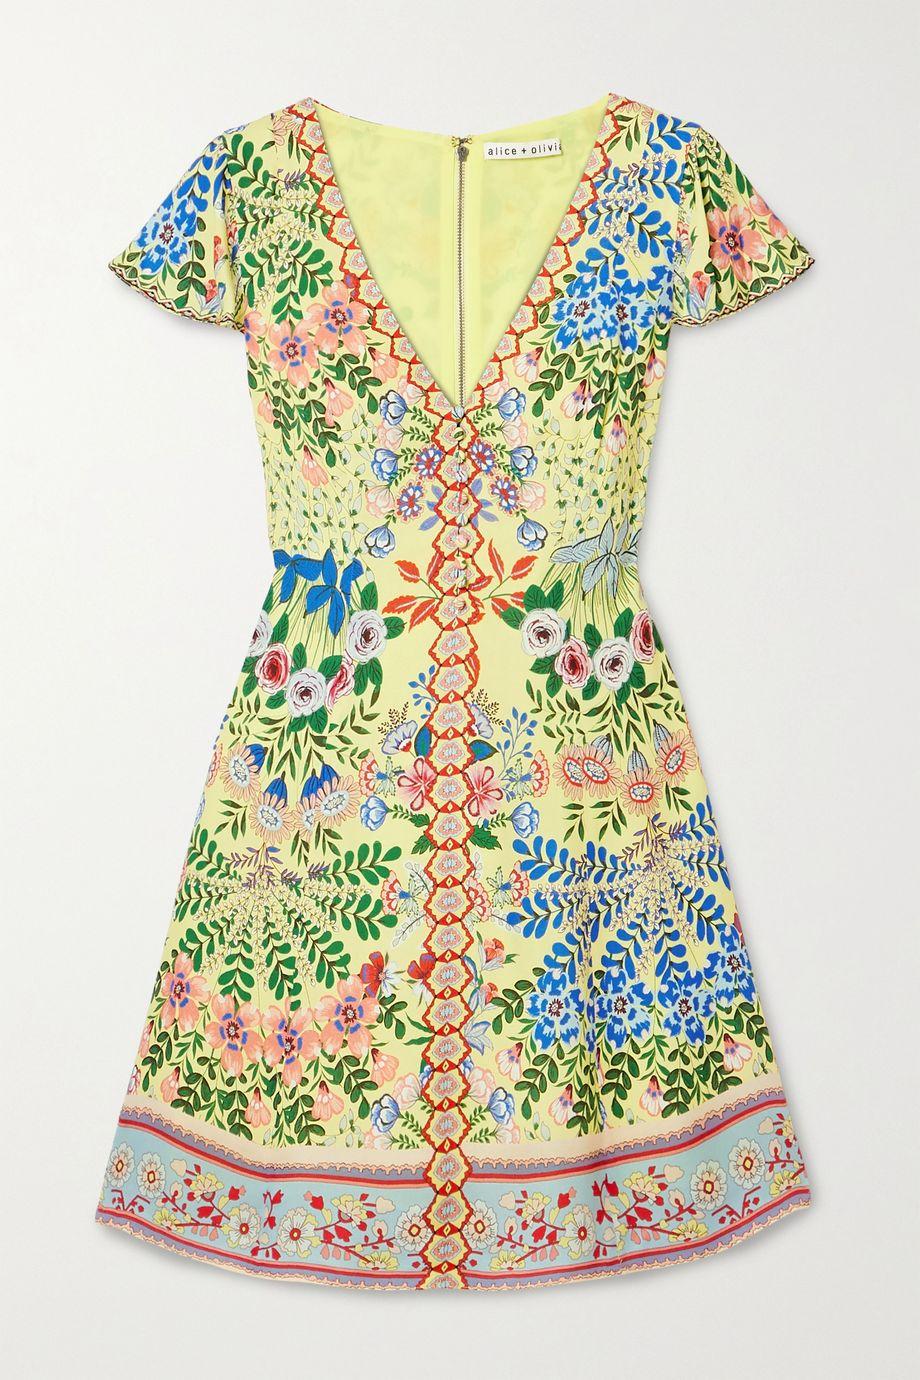 Alice + Olivia Mini-robe en crêpe de Chine à imprimé fleuri Hadley